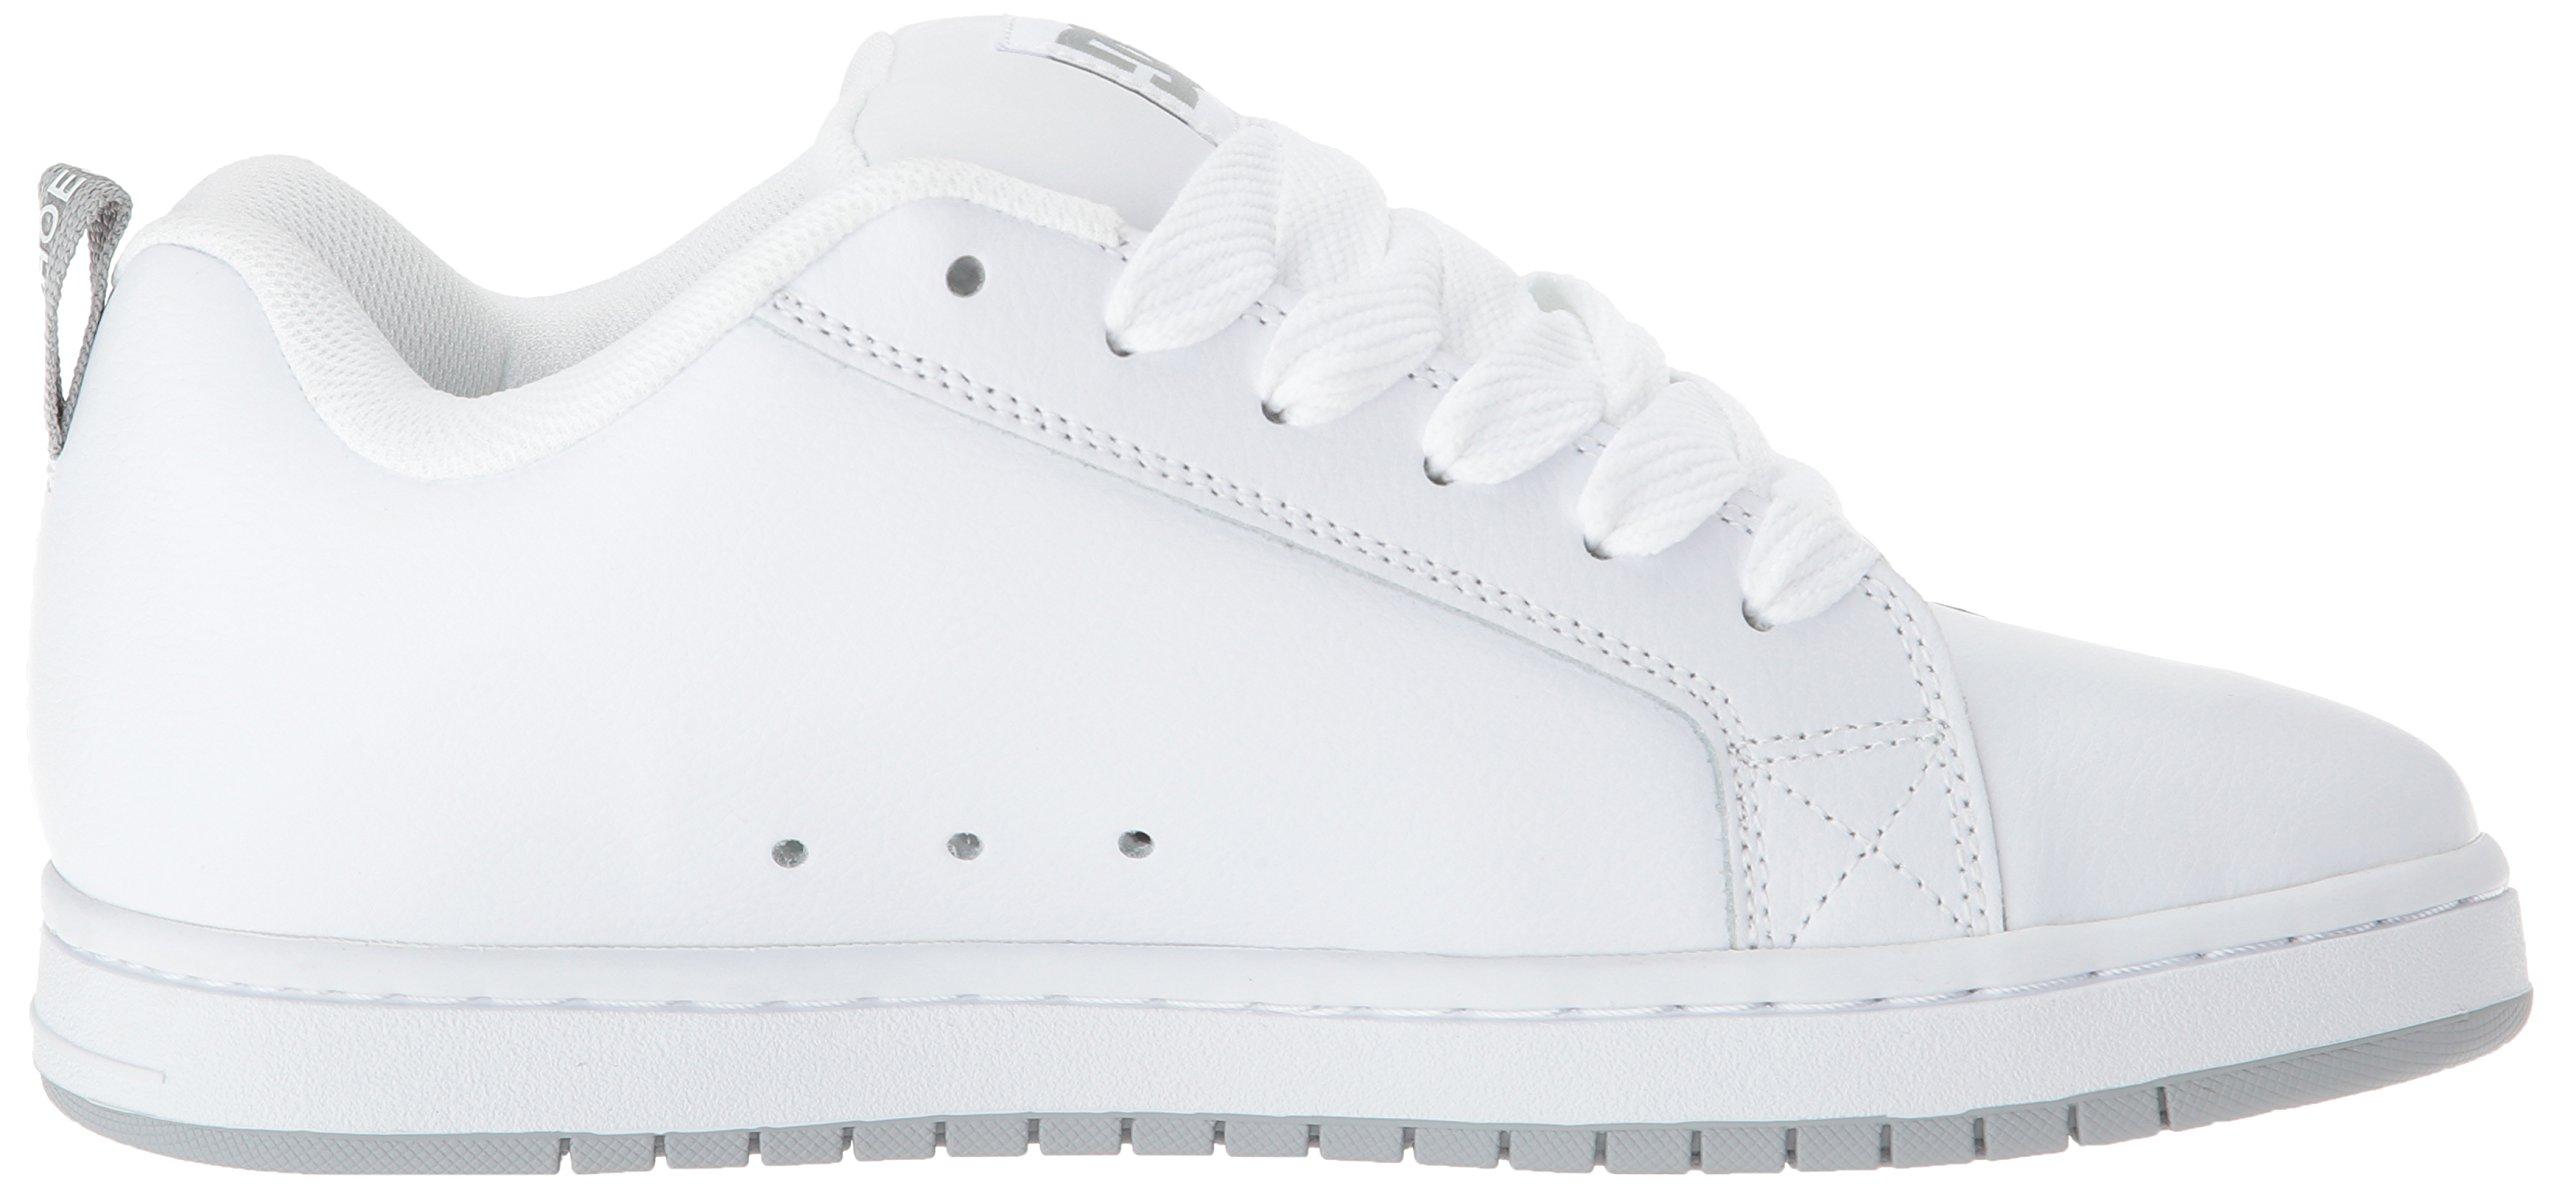 DC Men's Court Graffik SE Skate Shoe White Grey, 15 Medium US by DC (Image #6)